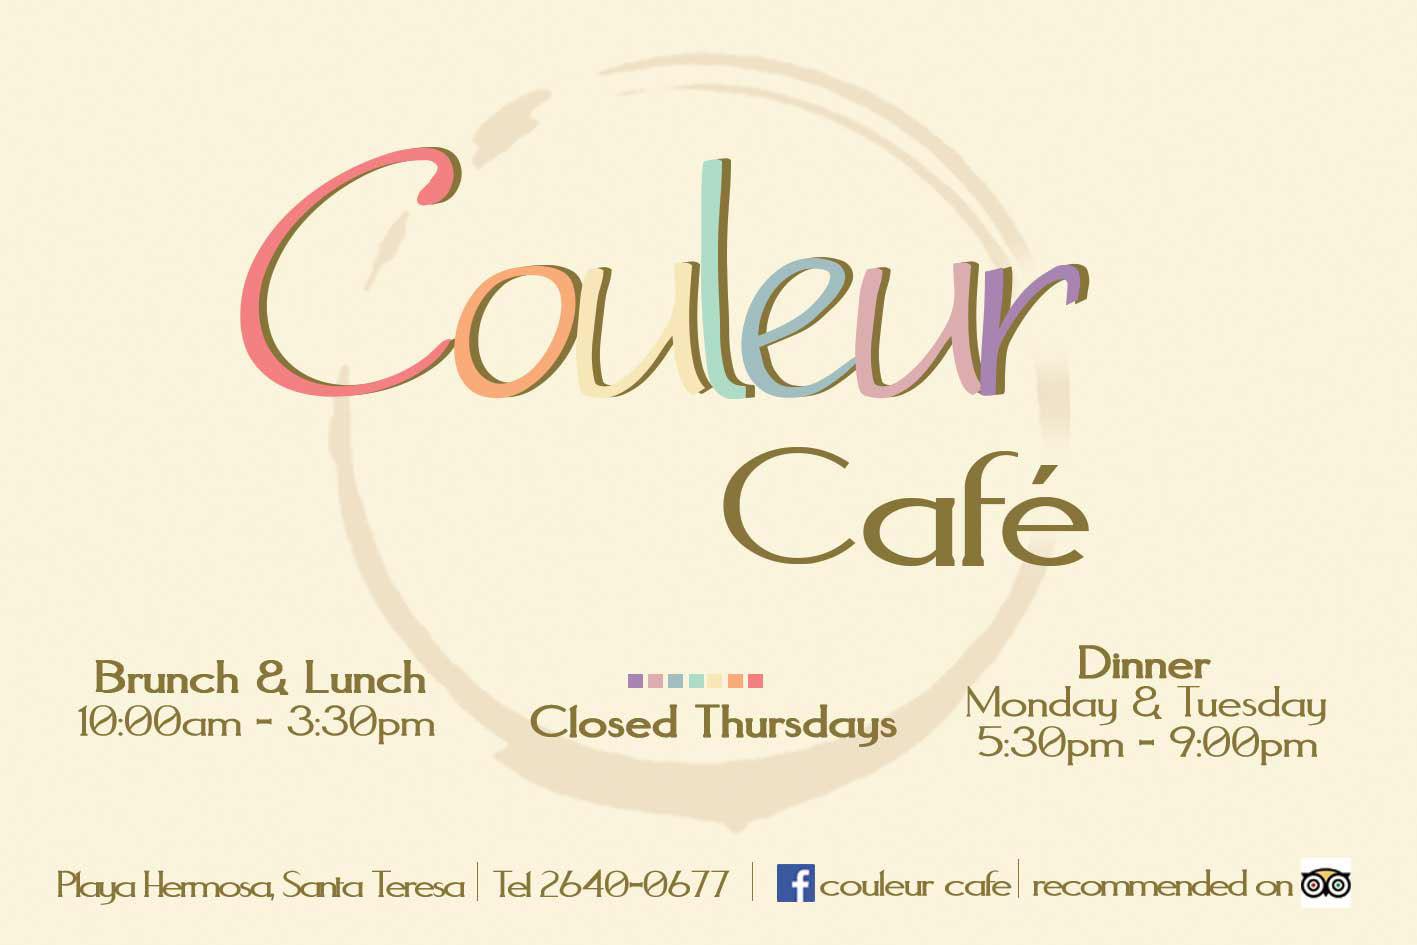 Lyndsey Coburn Portfolio Couleur Cafe